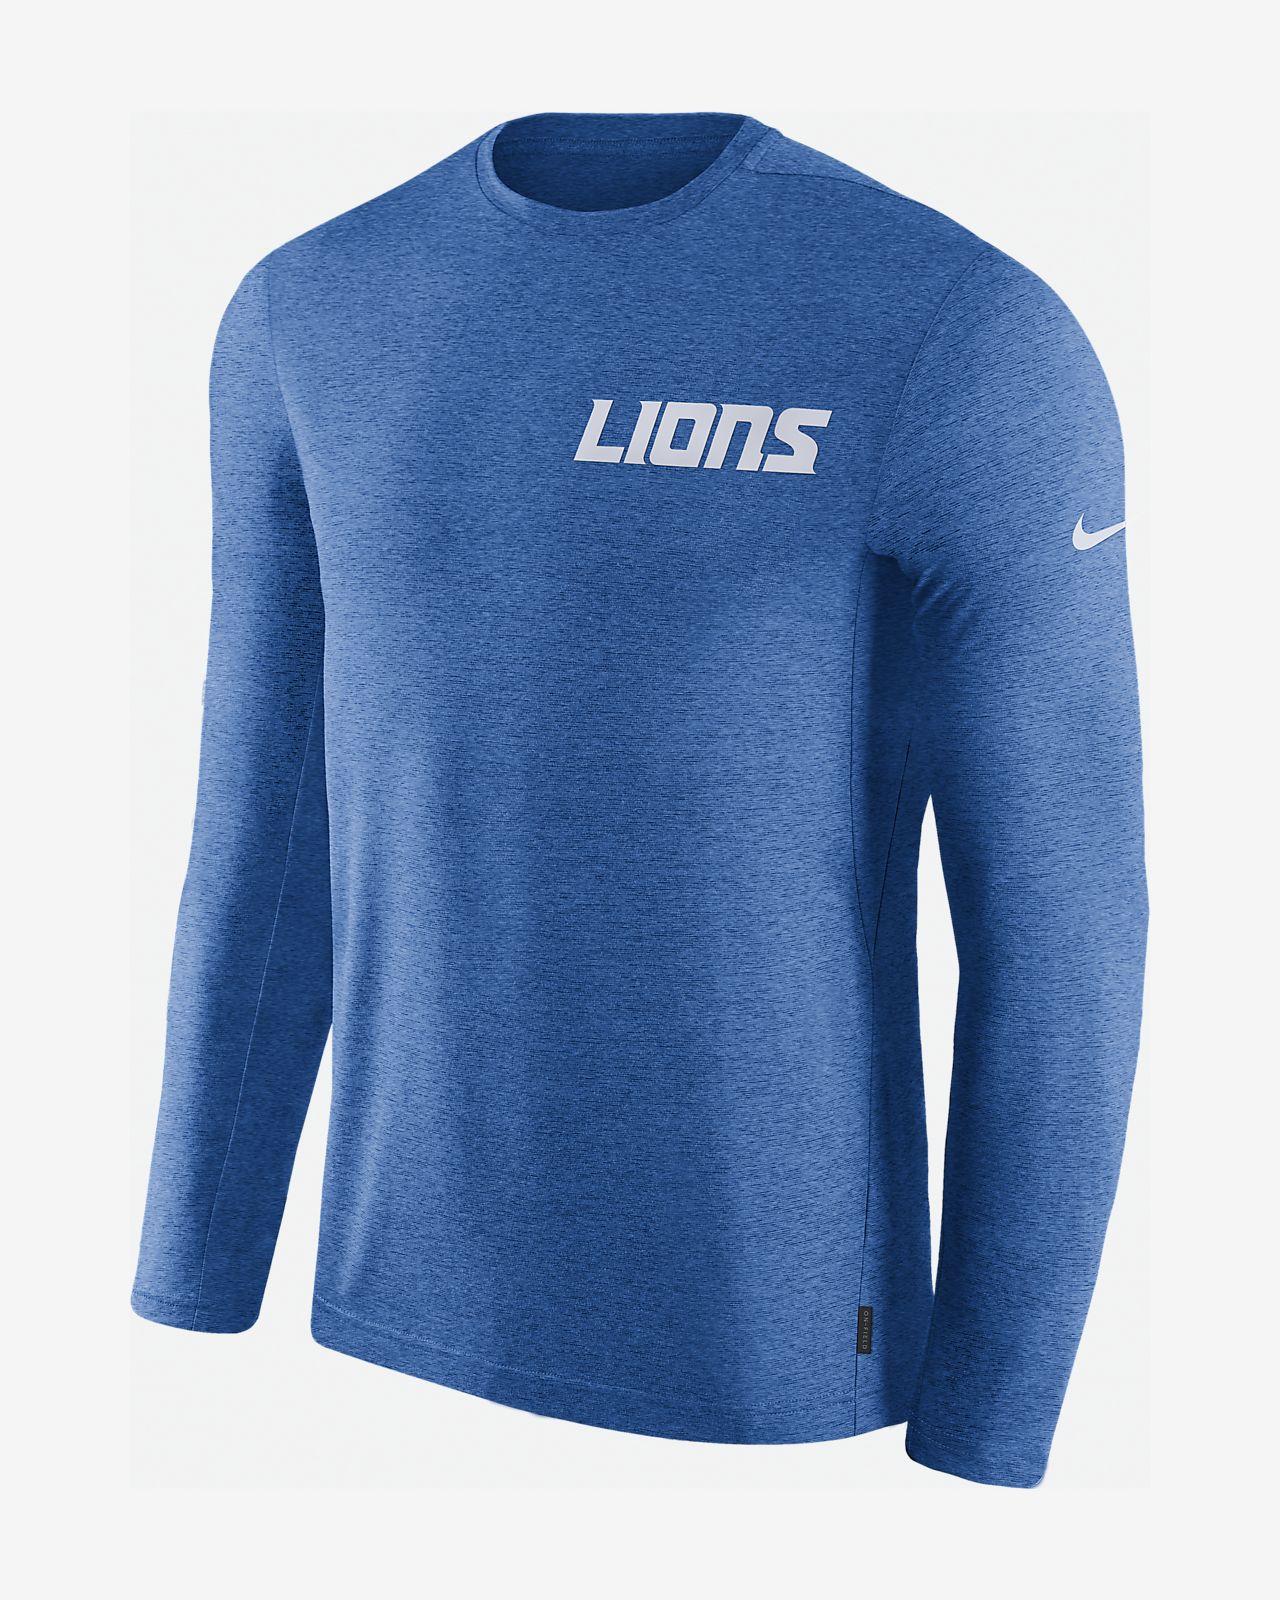 617aa416097824 Nike Dri-FIT Coach (NFL Lions) Men s Long-Sleeve Top. Nike.com